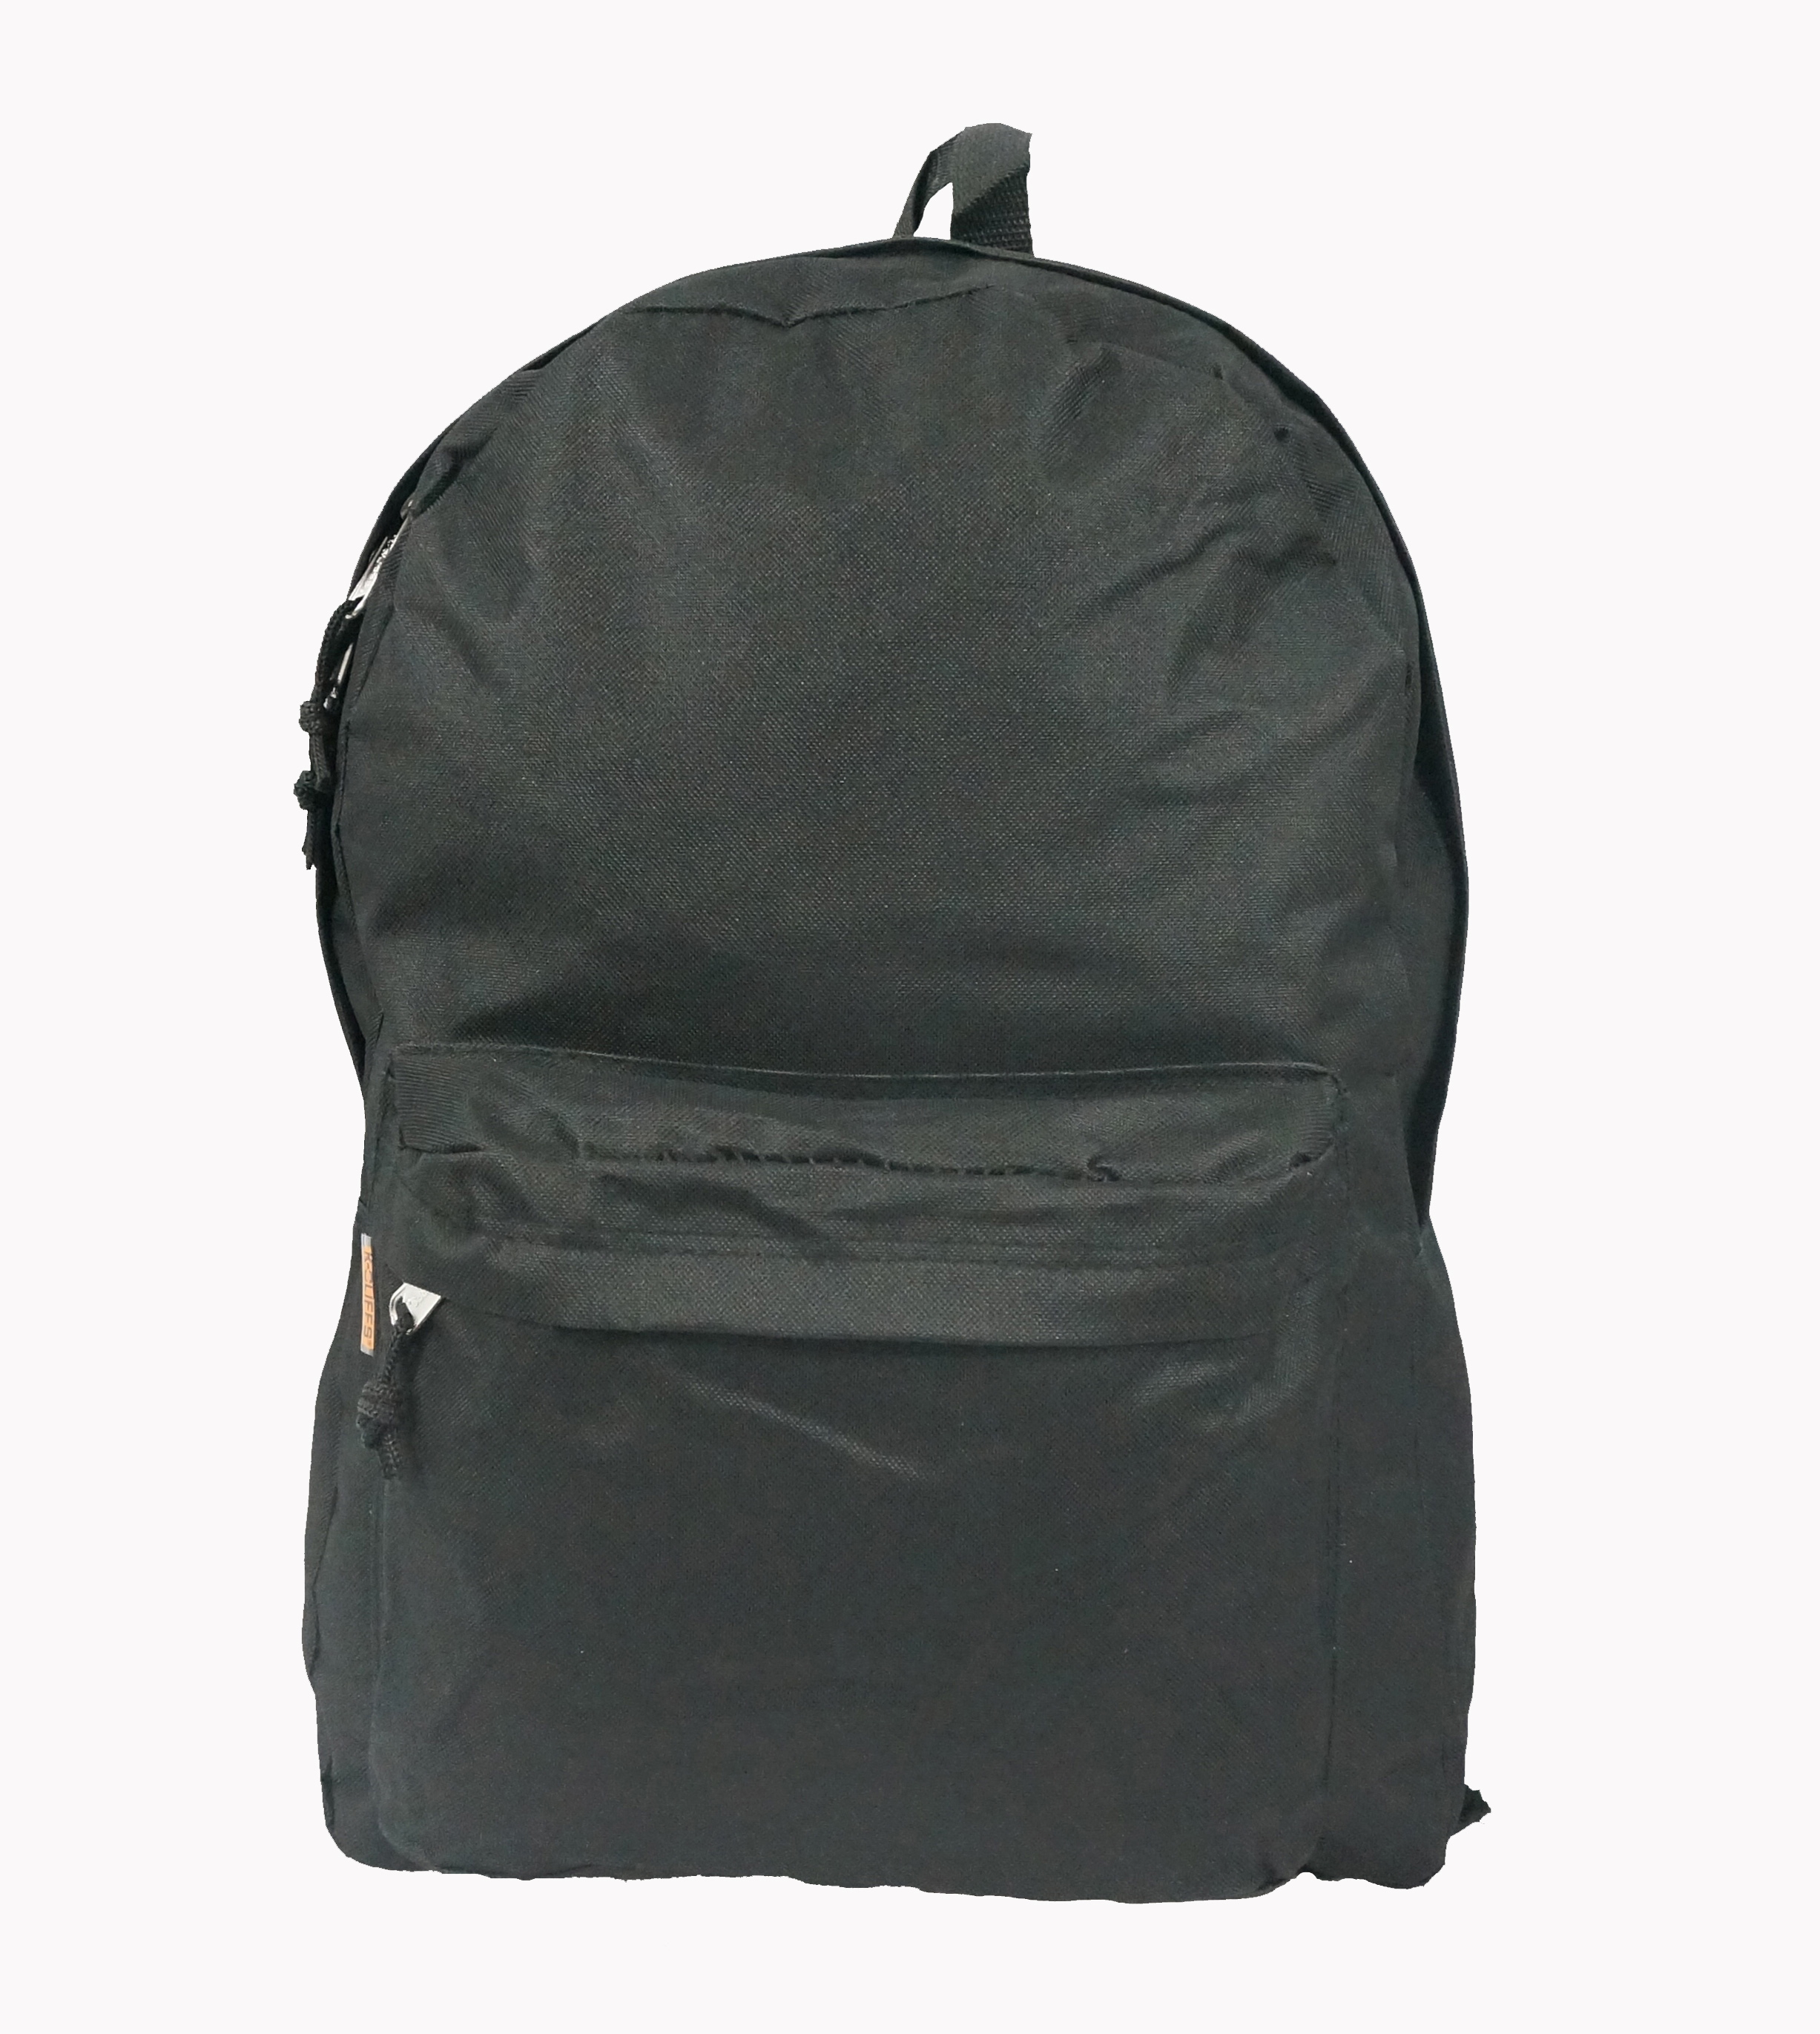 1a0f6795020f K-Cliffs - Backpack 18 inch Padded Back School Day Pack Classic Book Bag  Mesh Pocket Red - Walmart.com